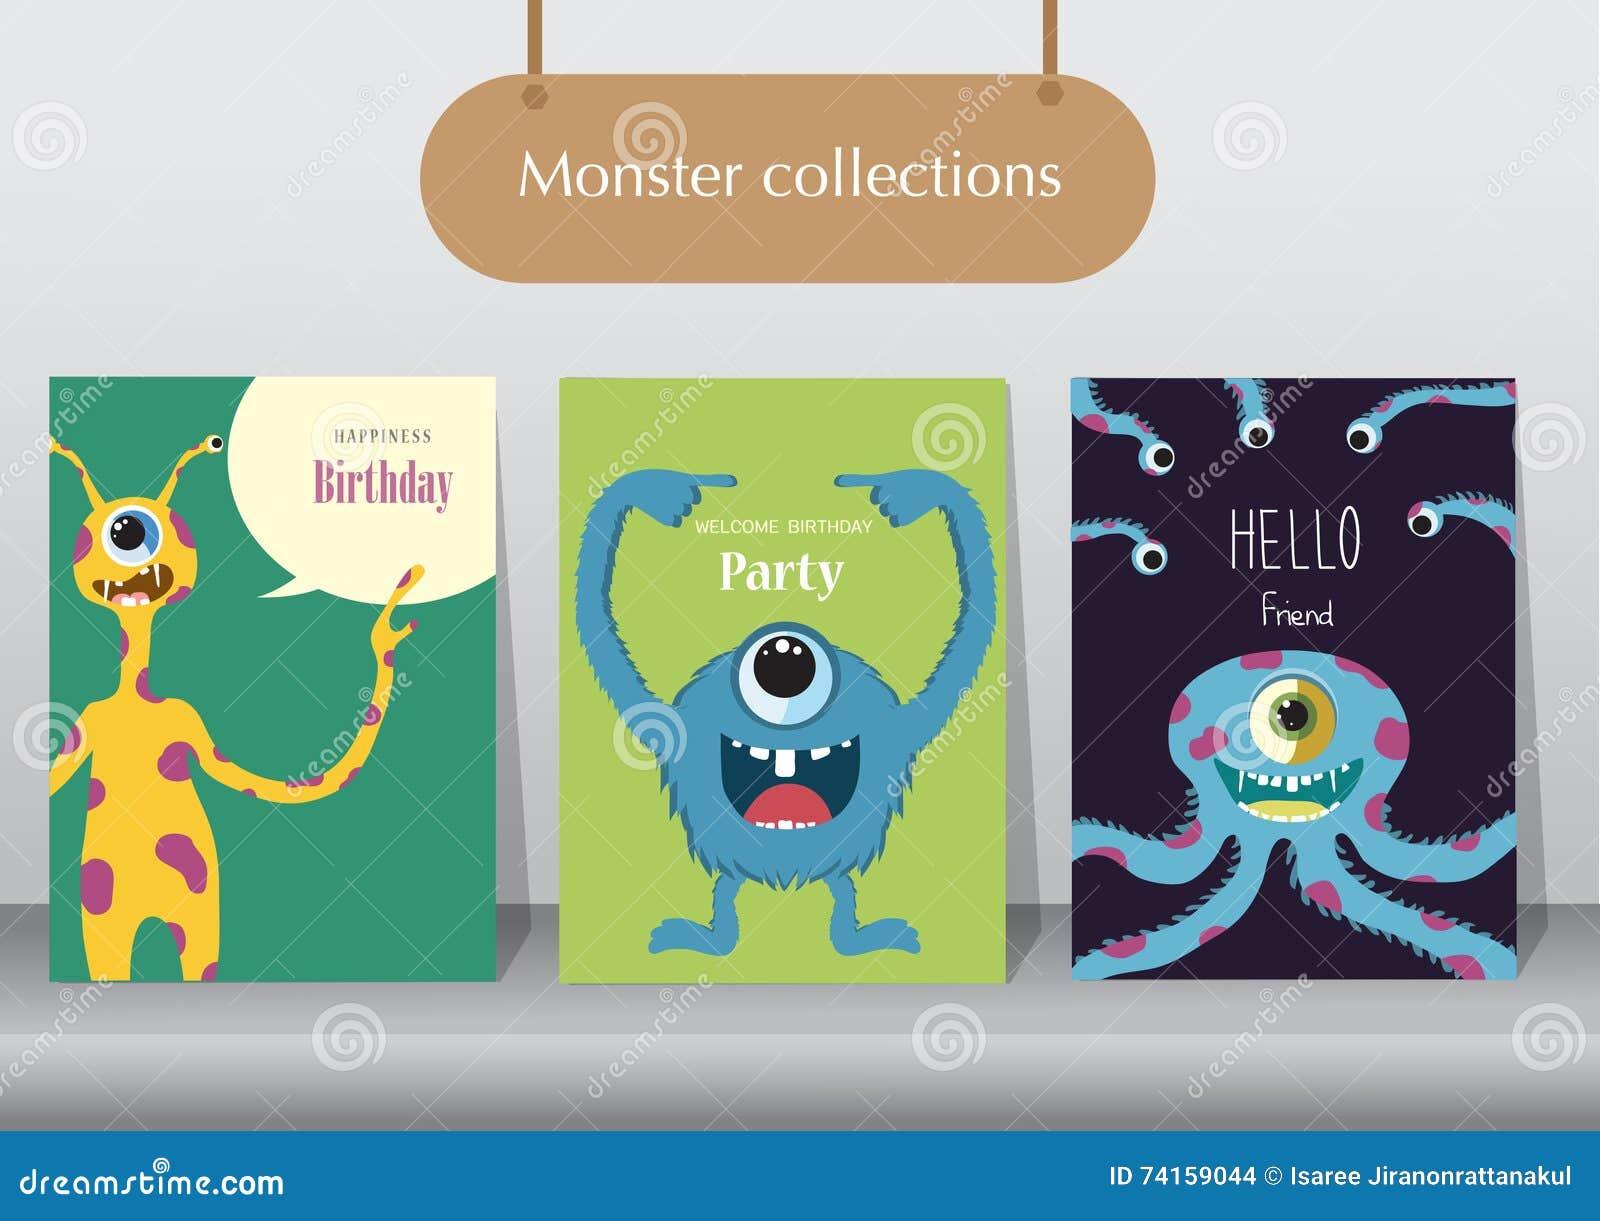 Set Of Birthday Cardspostertemplategreeting Cardsanimals – Set of Birthday Cards